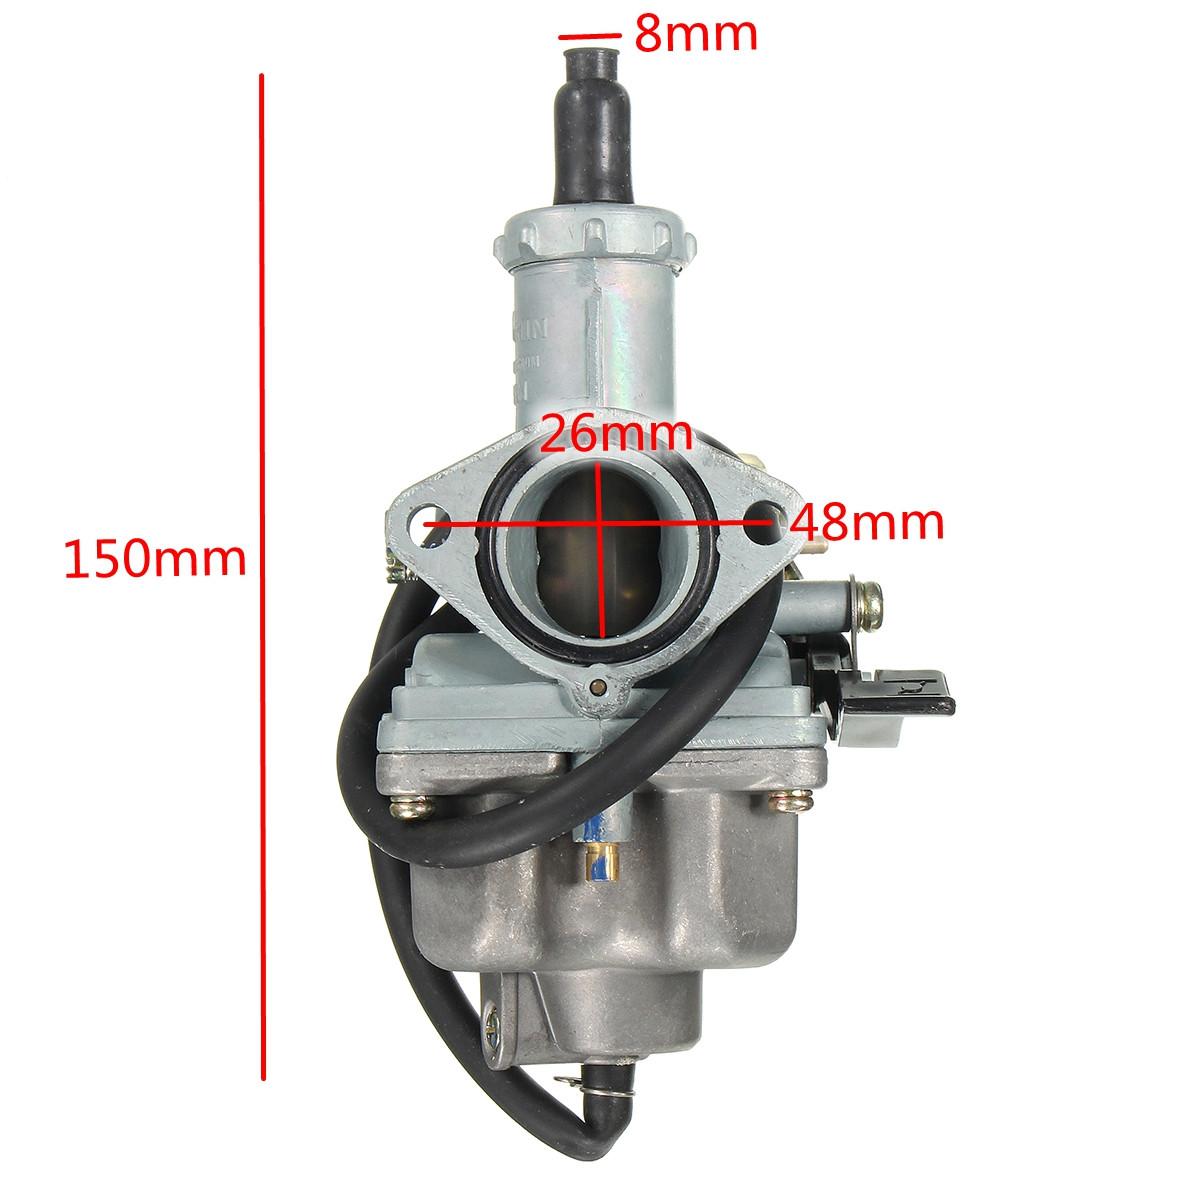 hight resolution of intake 26mm air filter carburetor 38mm carb for honda cb125 cb125s cg125